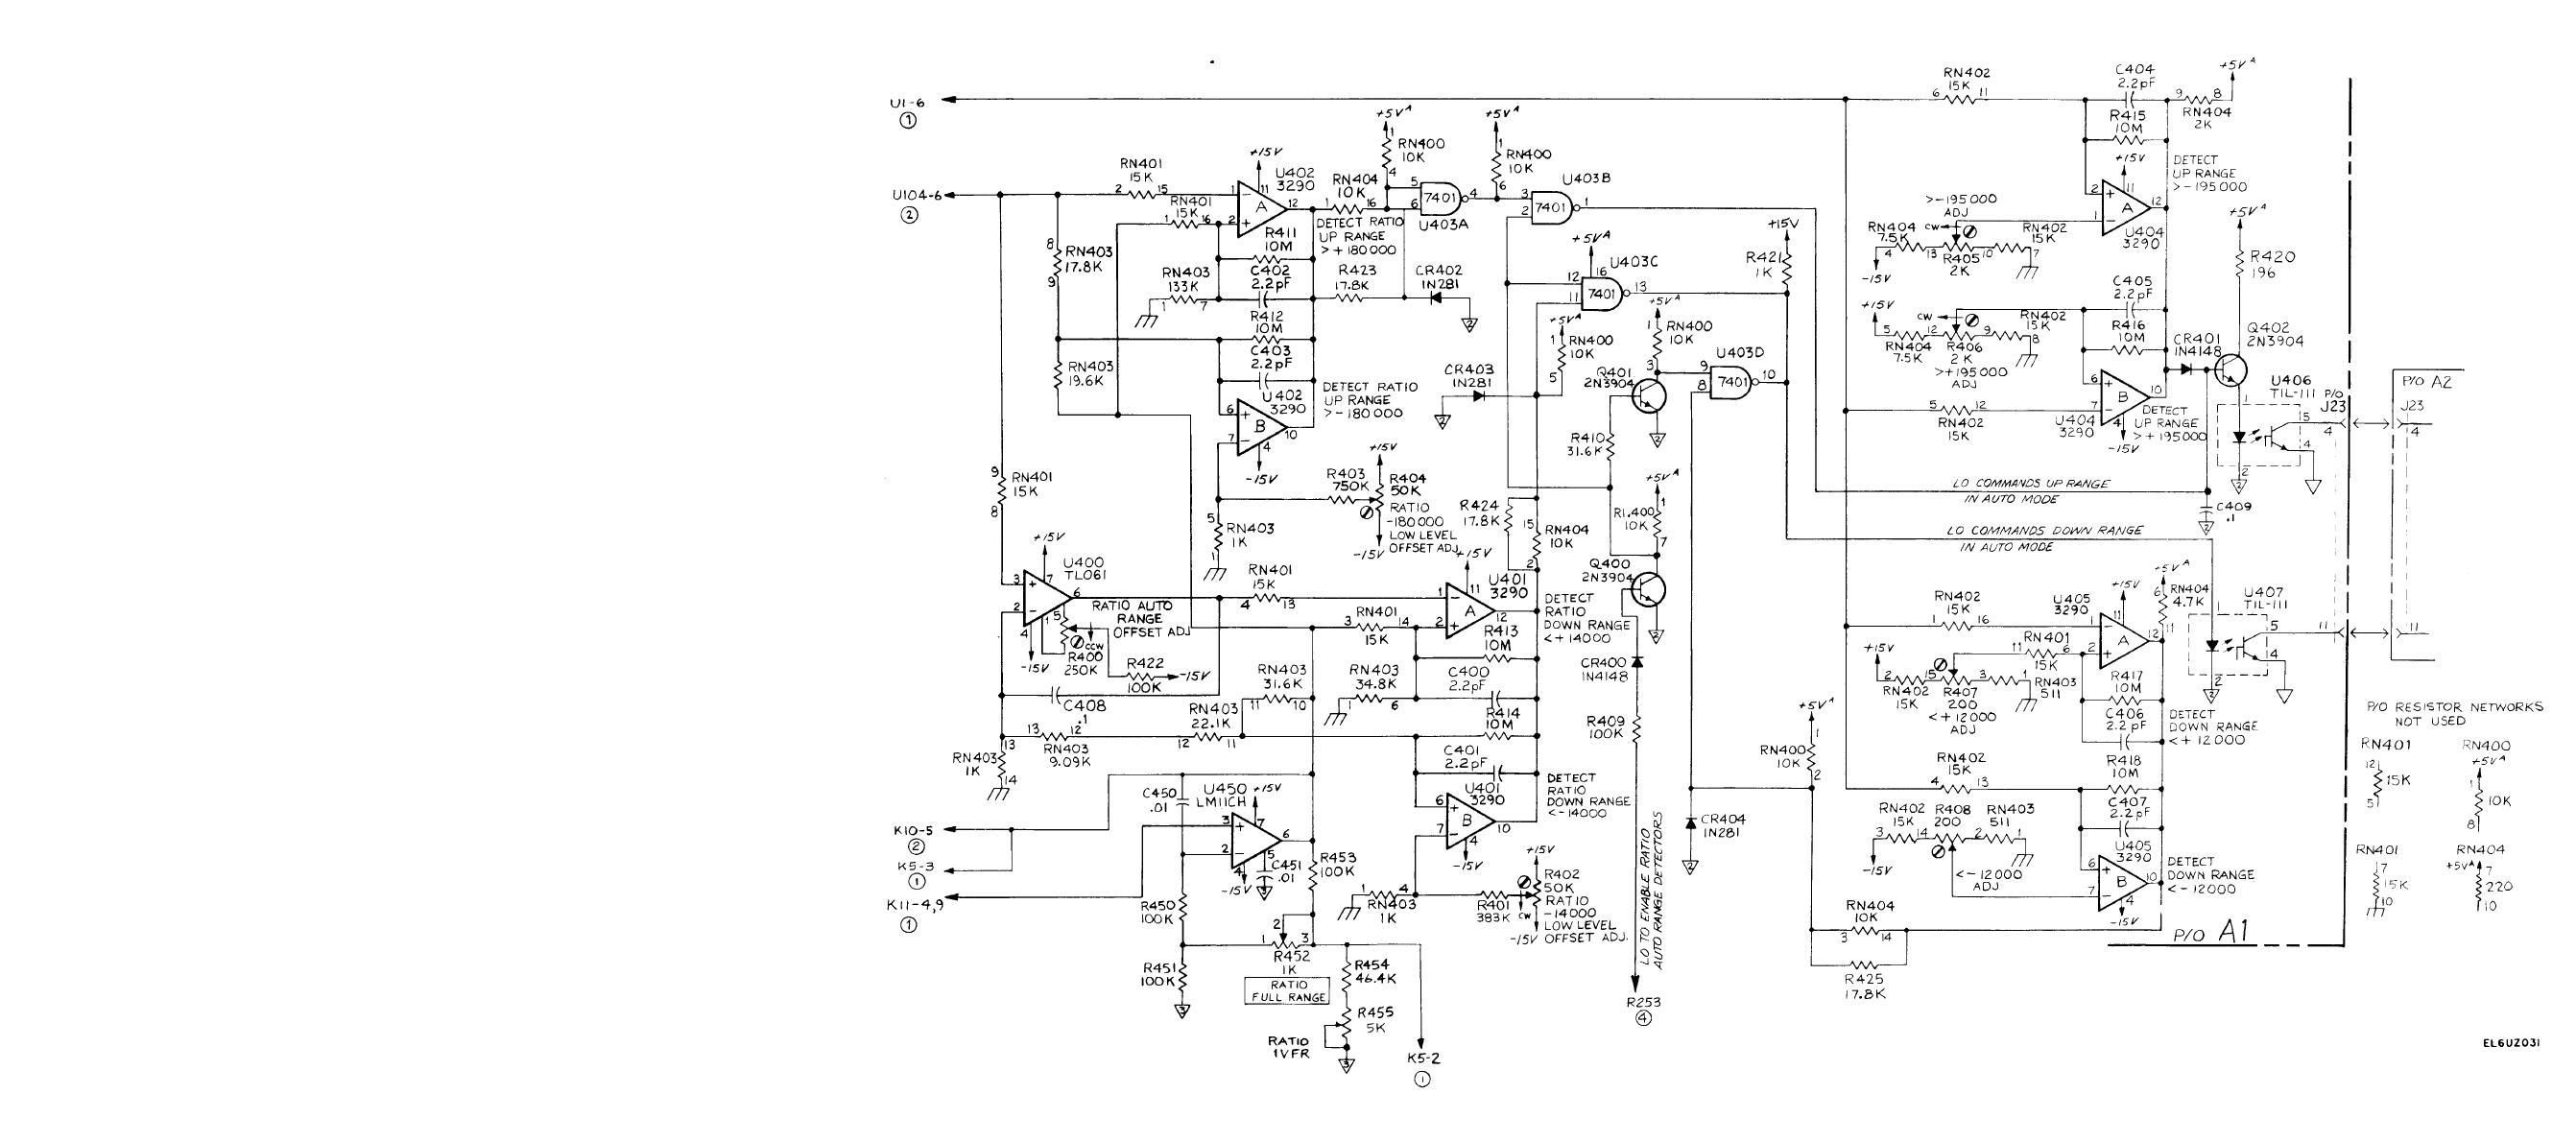 wiring diagram for automotive voltmeter baja 50cc atv figure fo 5 auto range up down detectors a1 schematic